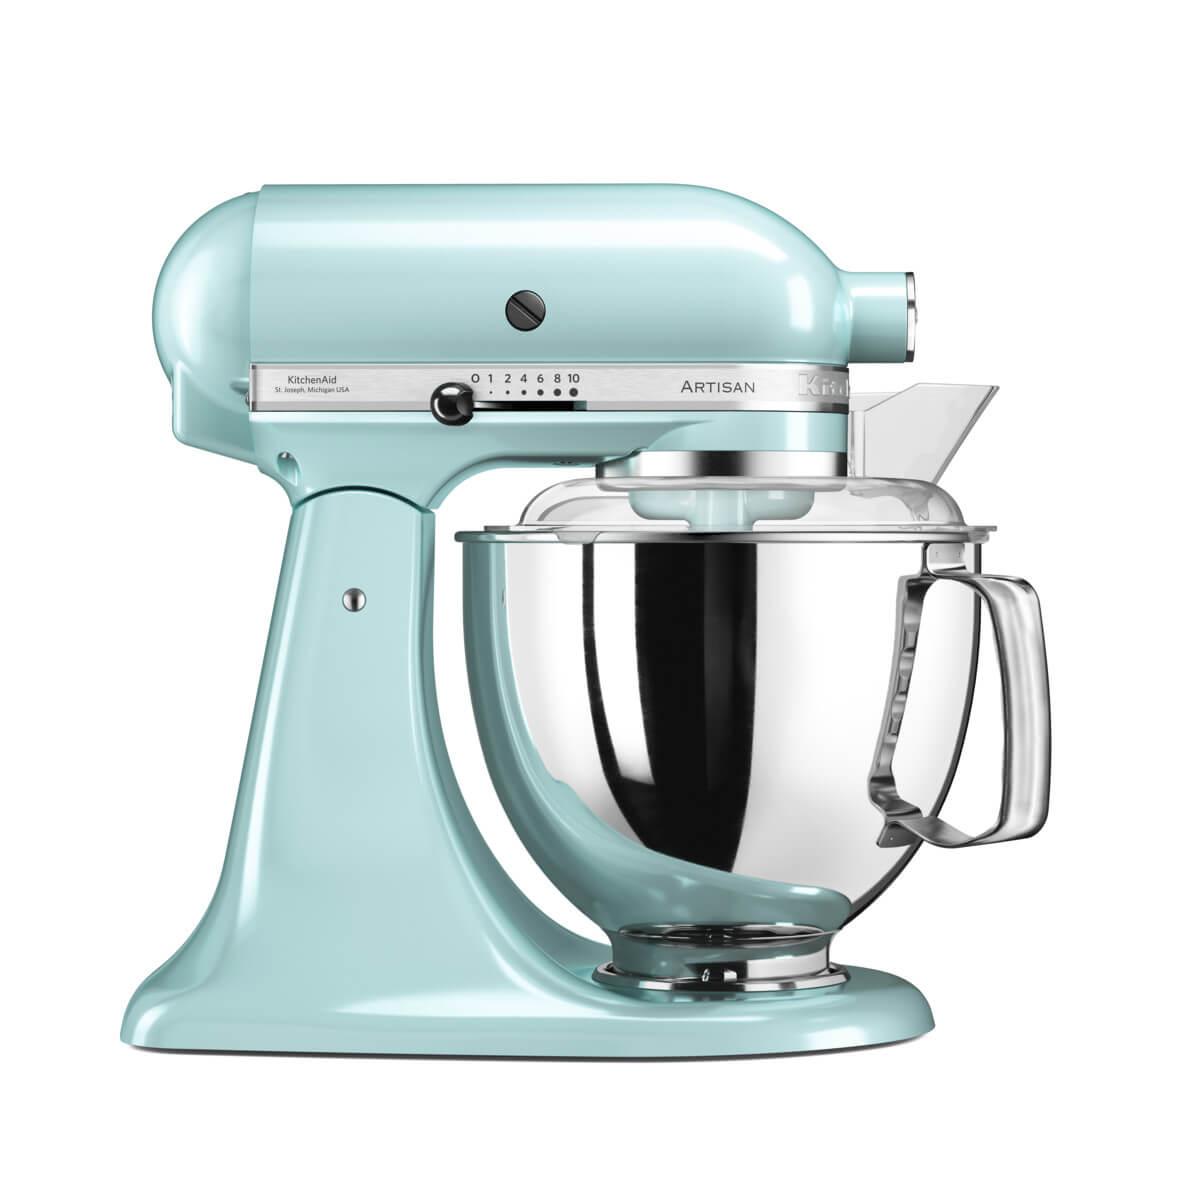 KitchenAid samostojeći mikser Artisan (4,8 l) – 5KSM175PS - BoysenberryKitchenAid samostojeći mikser Artisan (4,8 l) – 5KSM175PS - Ice Blue